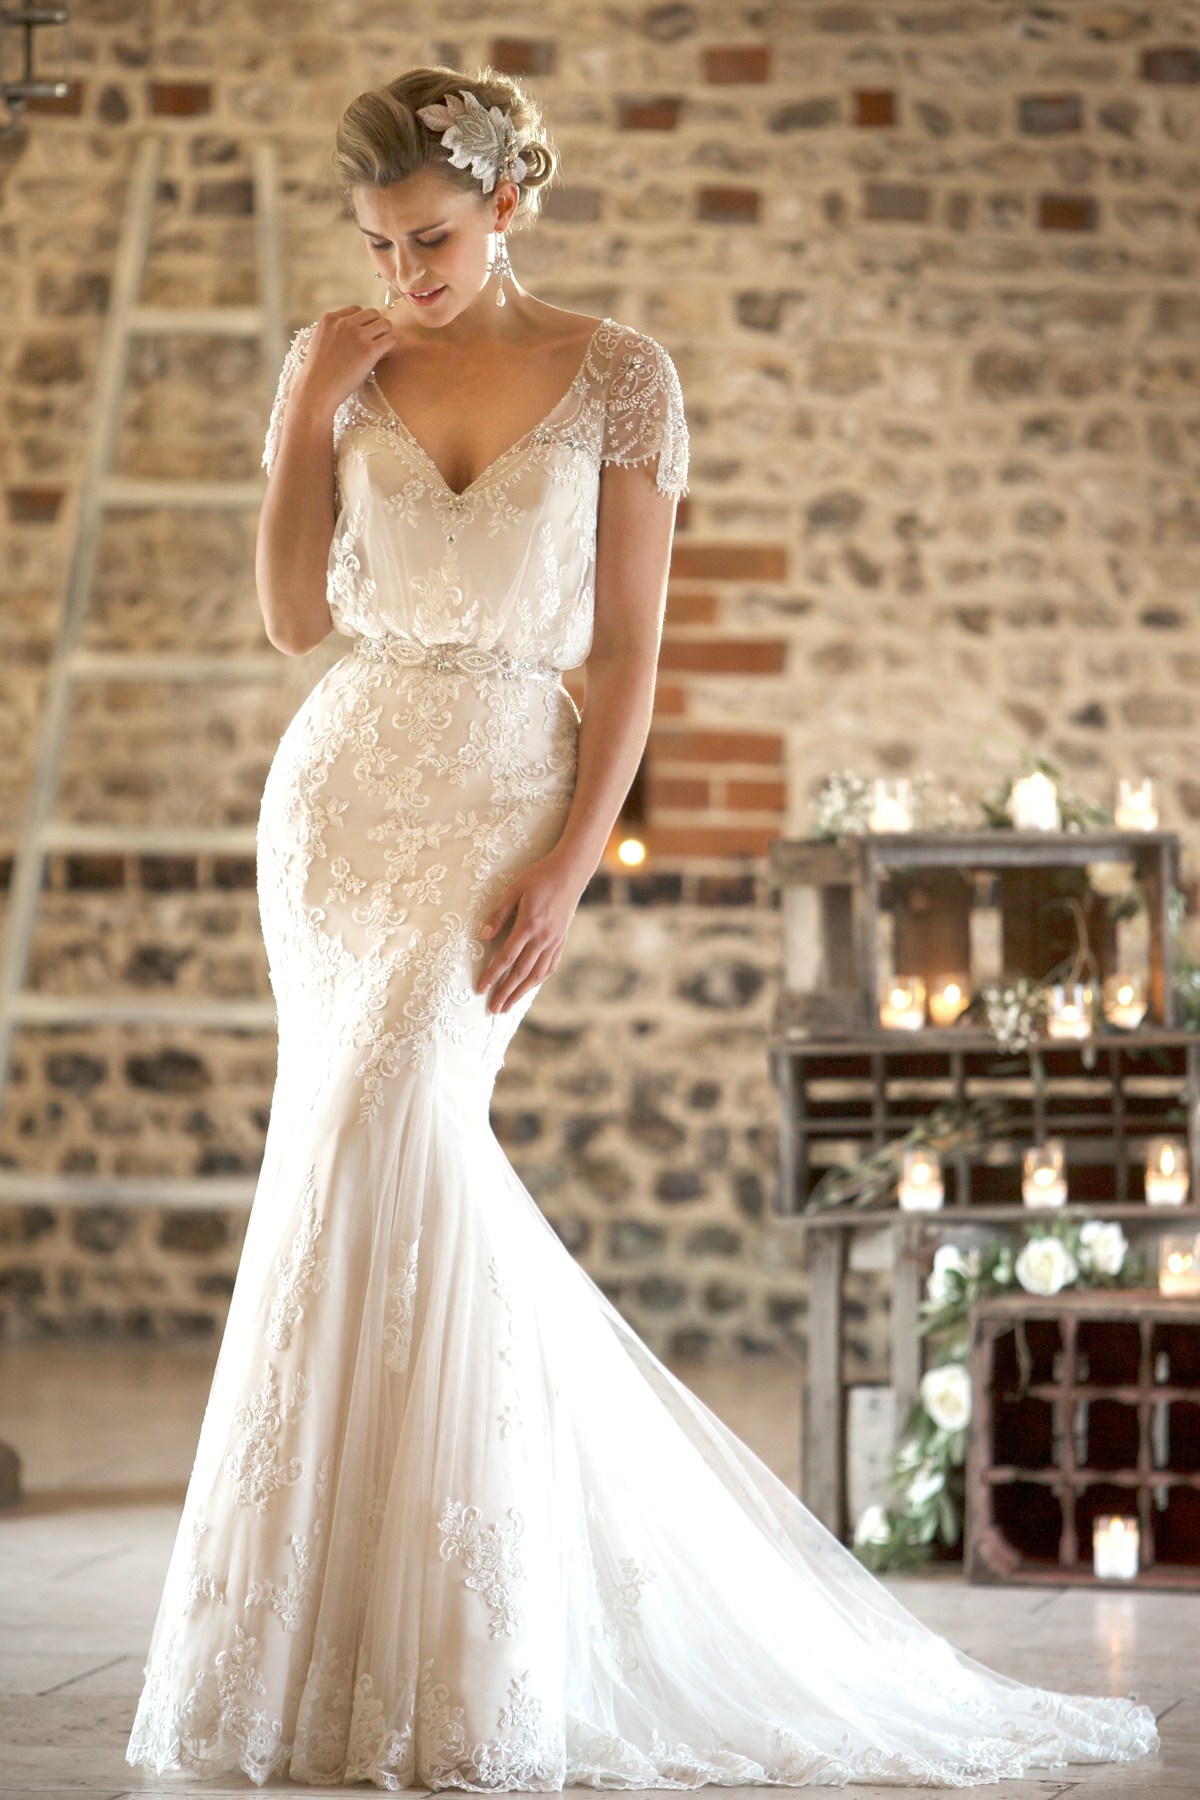 True Bride - Figure Flattering Wedding Dresses For Brides & BridesMaids (Bridal Fashion Fashion & Beauty Get Inspired Supplier Spotlight )